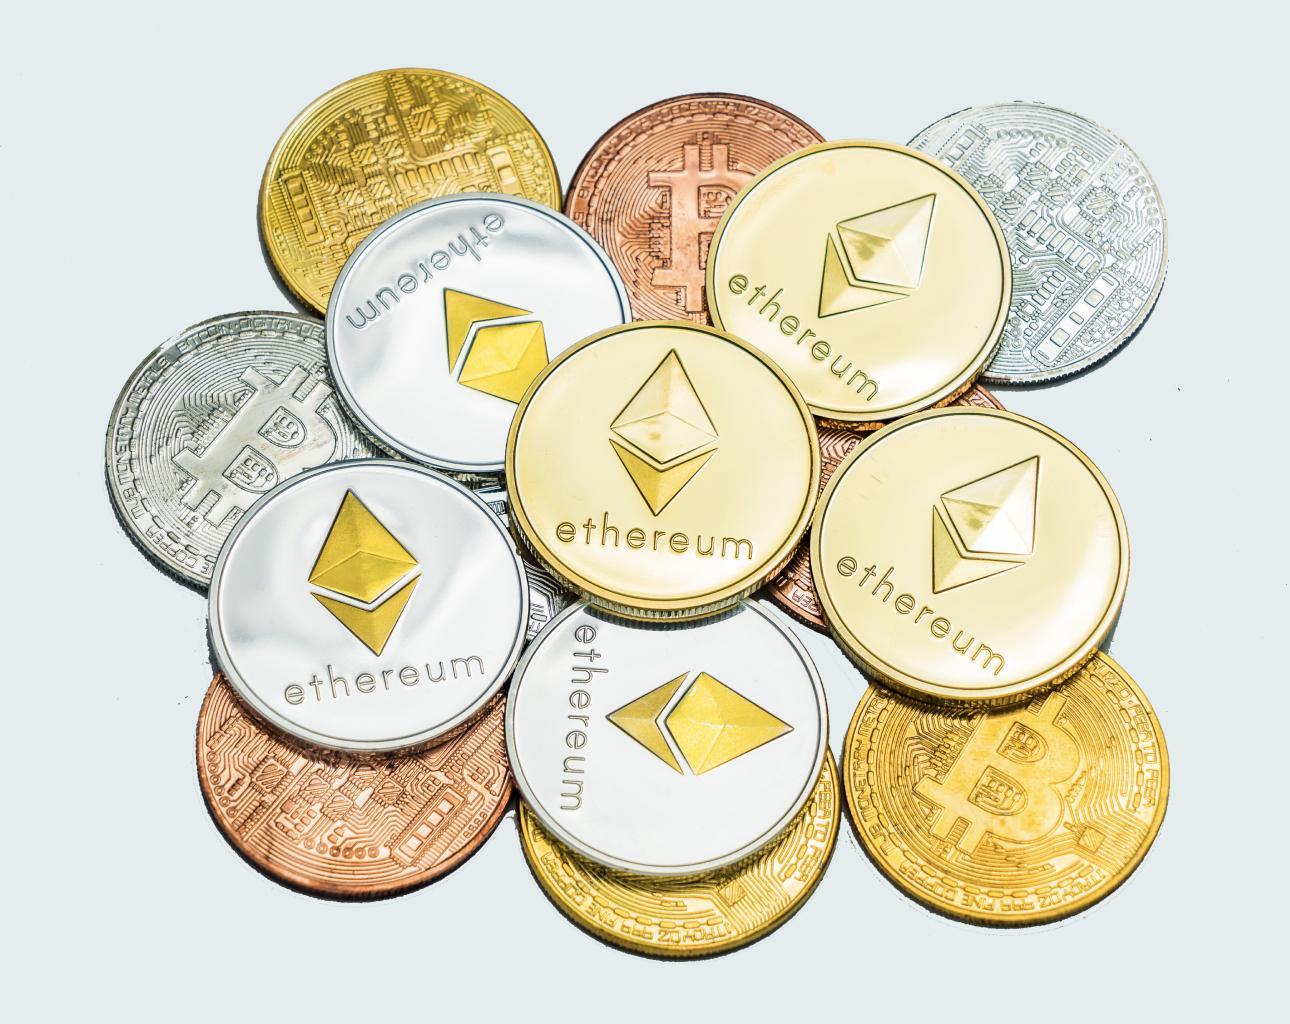 como abrir uma conta corporativa para negociar criptomoeda porque comprar bitcoin